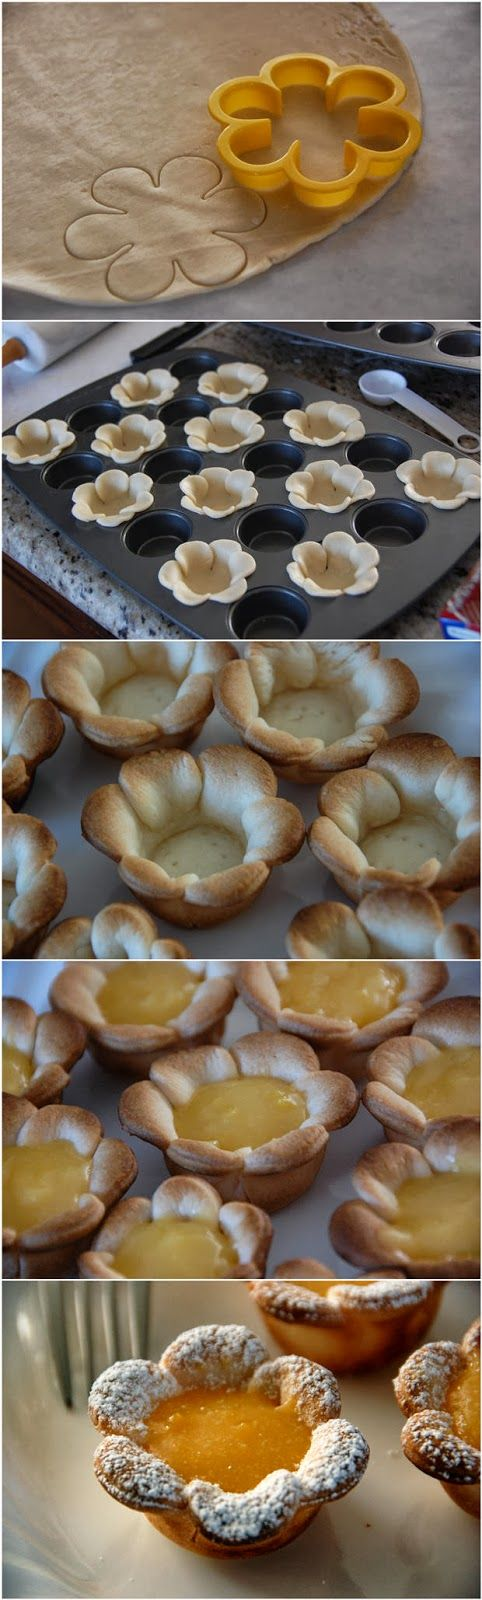 Flower shaped Mini Lemon Curd Tarts - kiss recipe